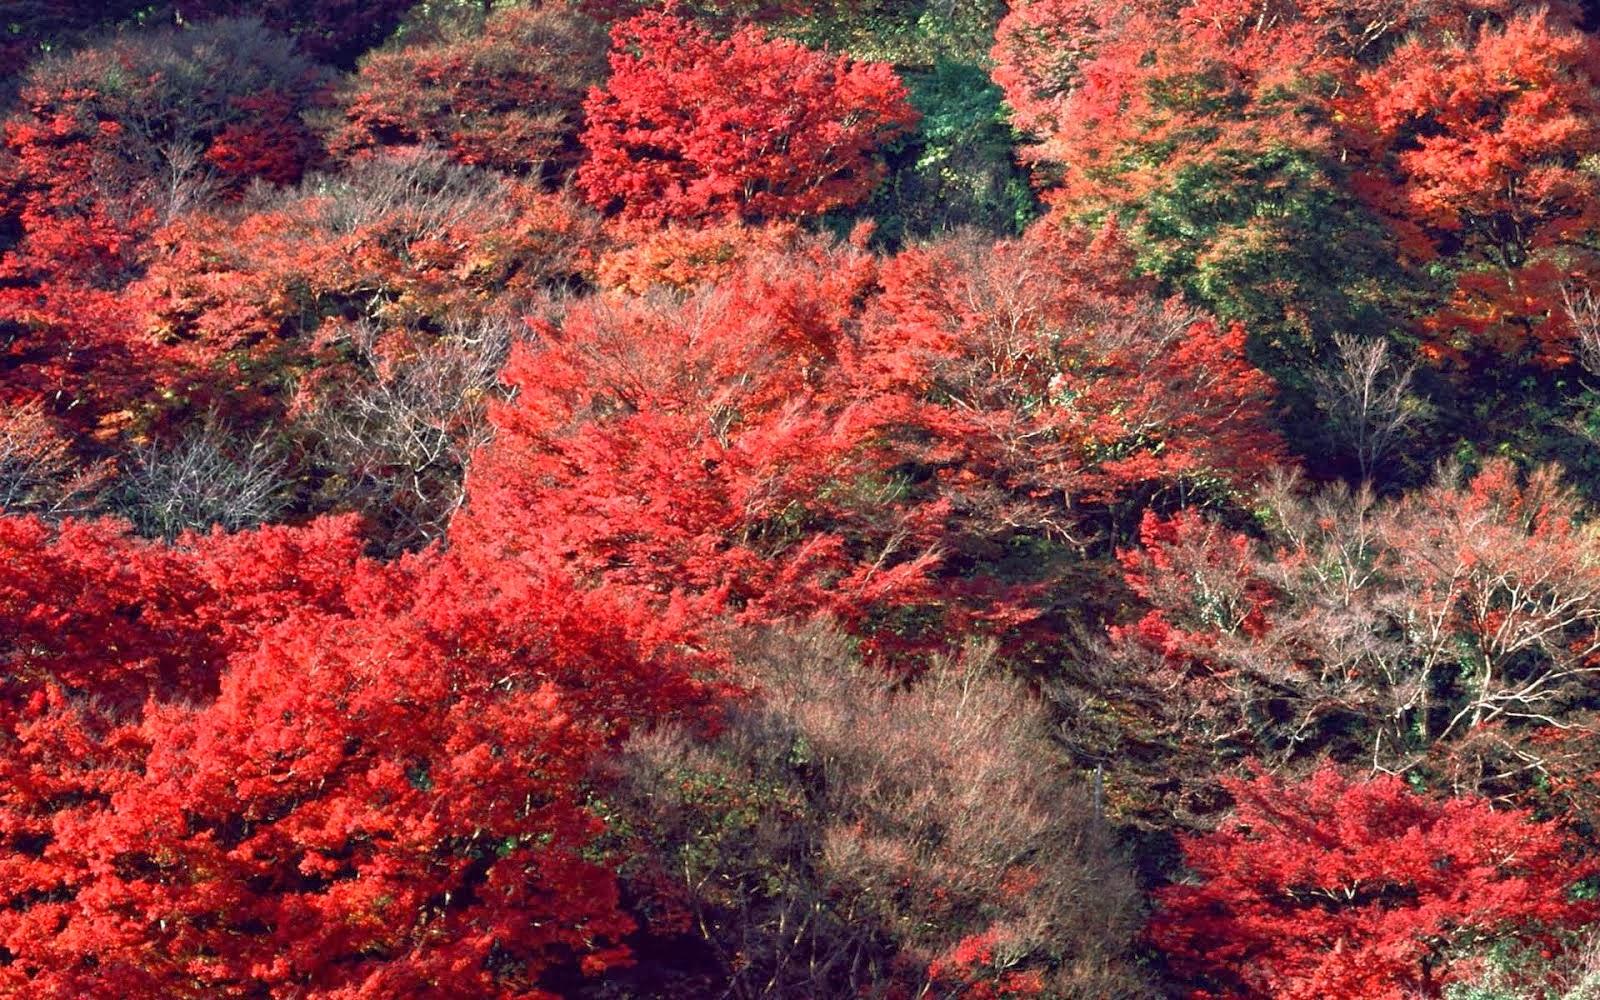 autumn nature hd wallpaper 1080p autumn nature hd wallpaper 1080p 1600x1000